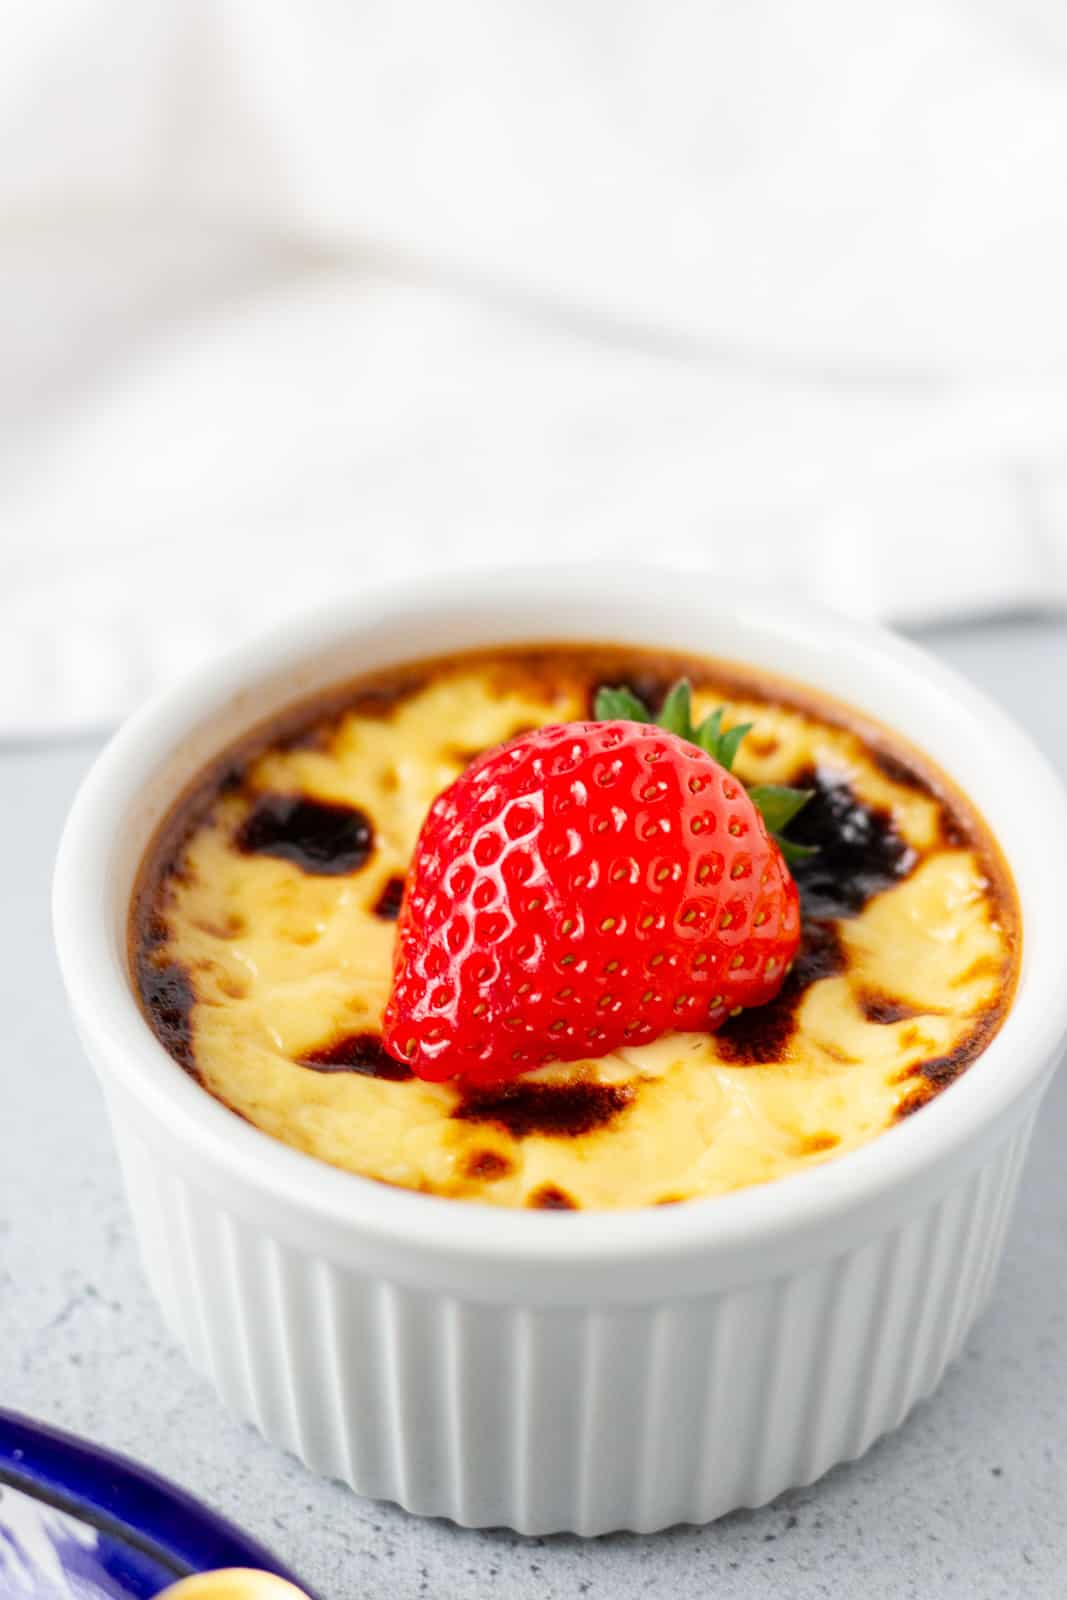 Single custard in a white ramekin with a strawberry on top.